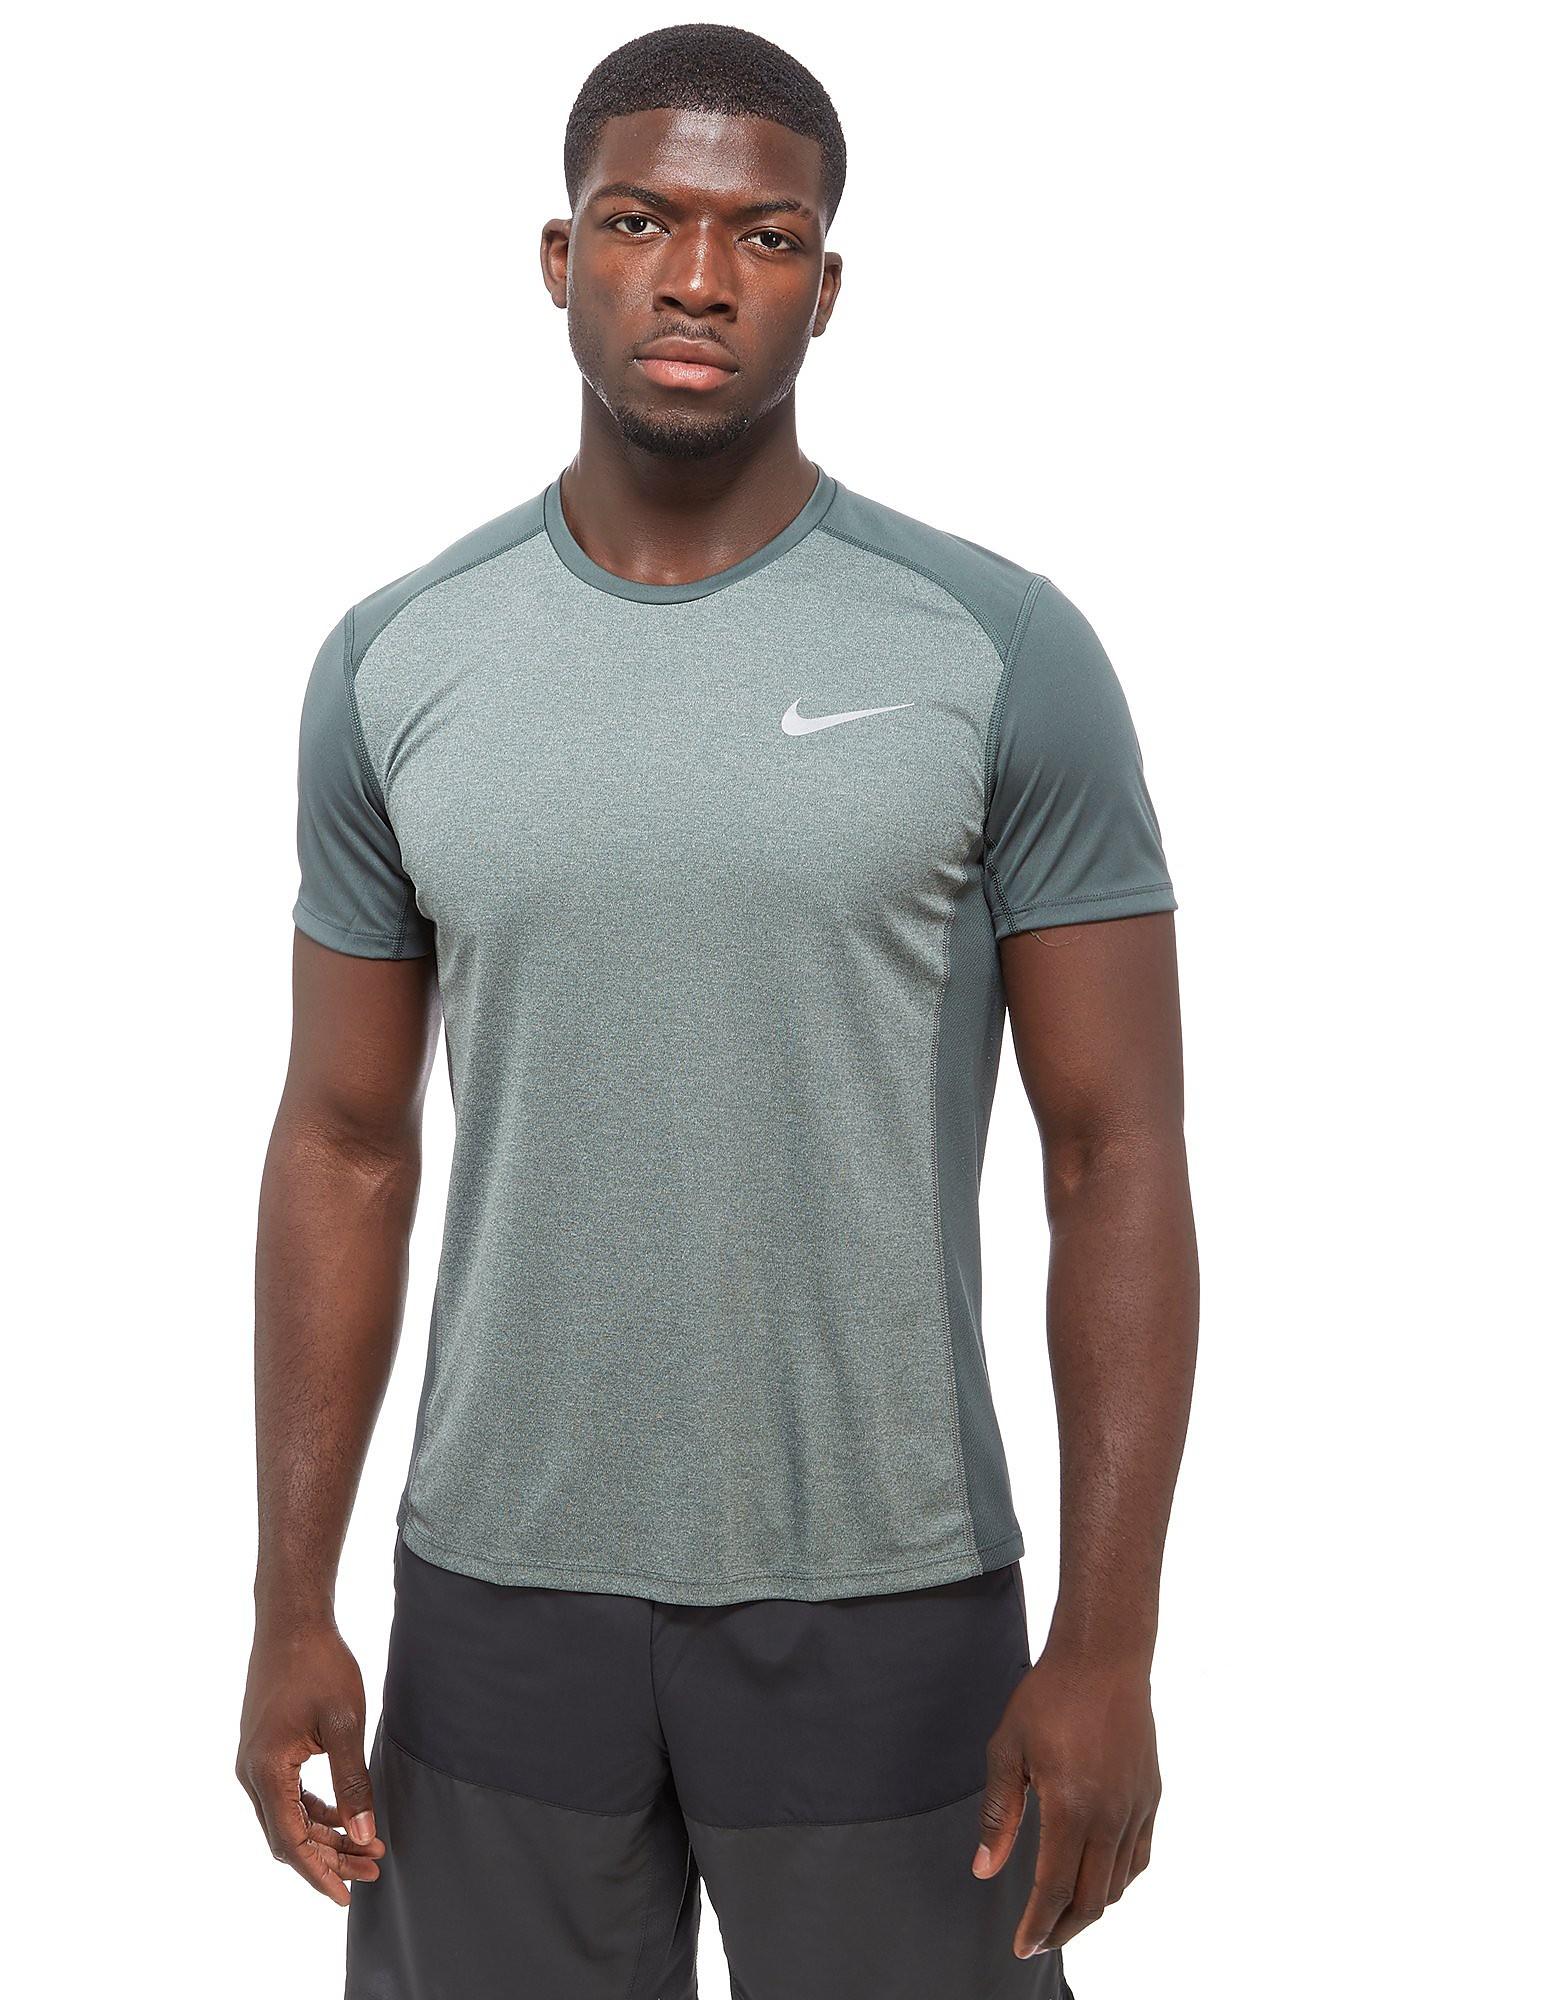 Nike Dry Miler T-Shirt